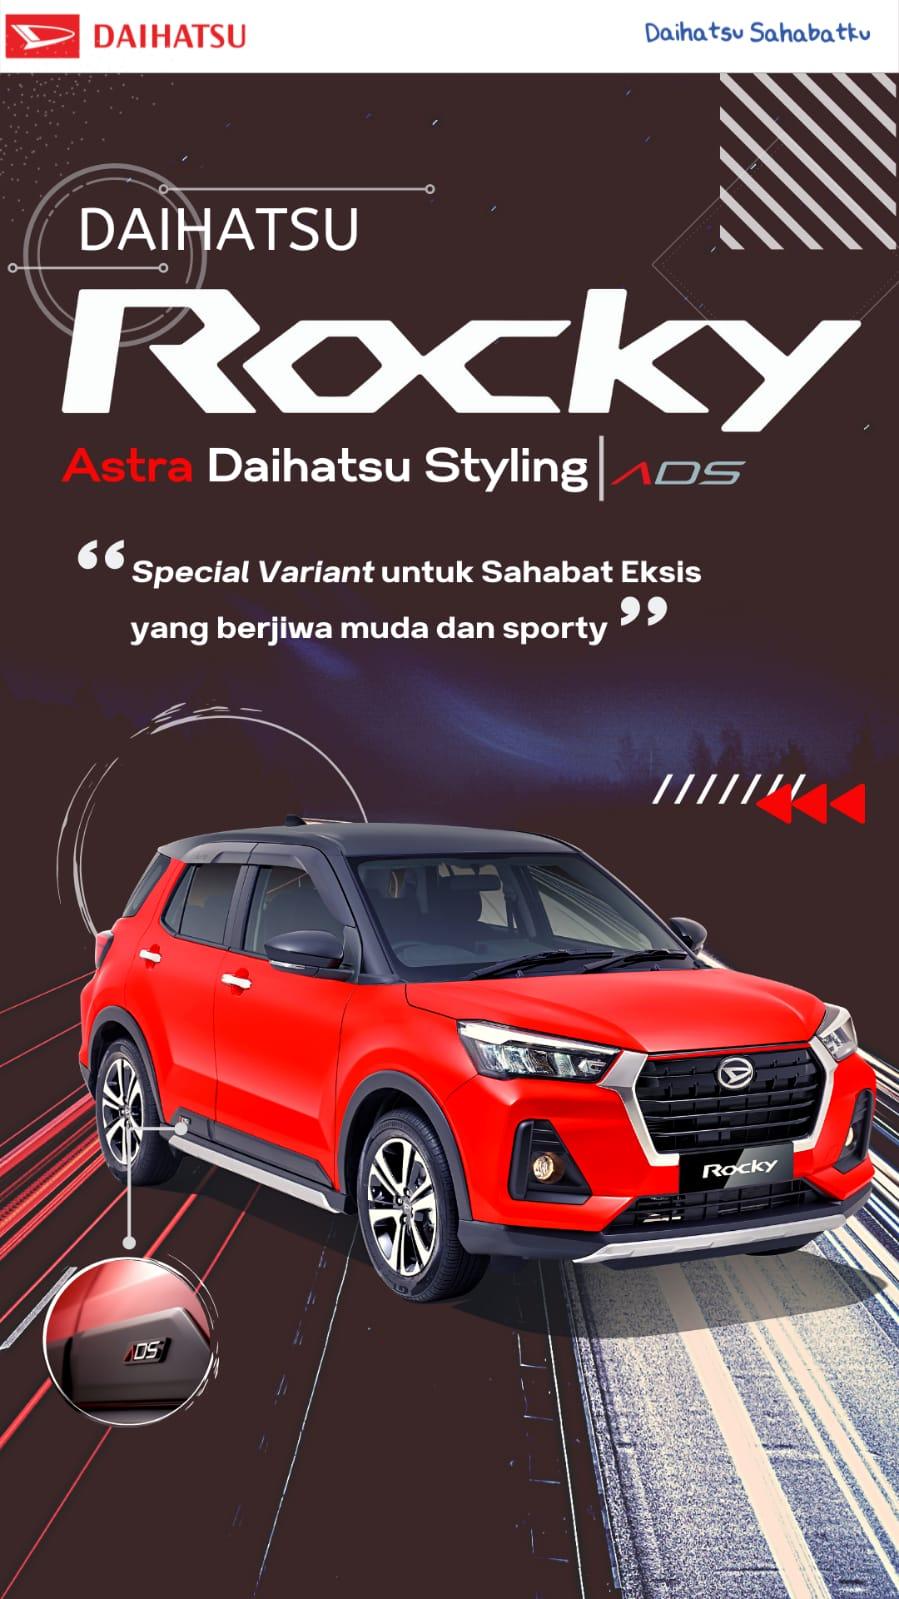 Promo-Daihatsu-Tulungagung-2021-Rocky-6